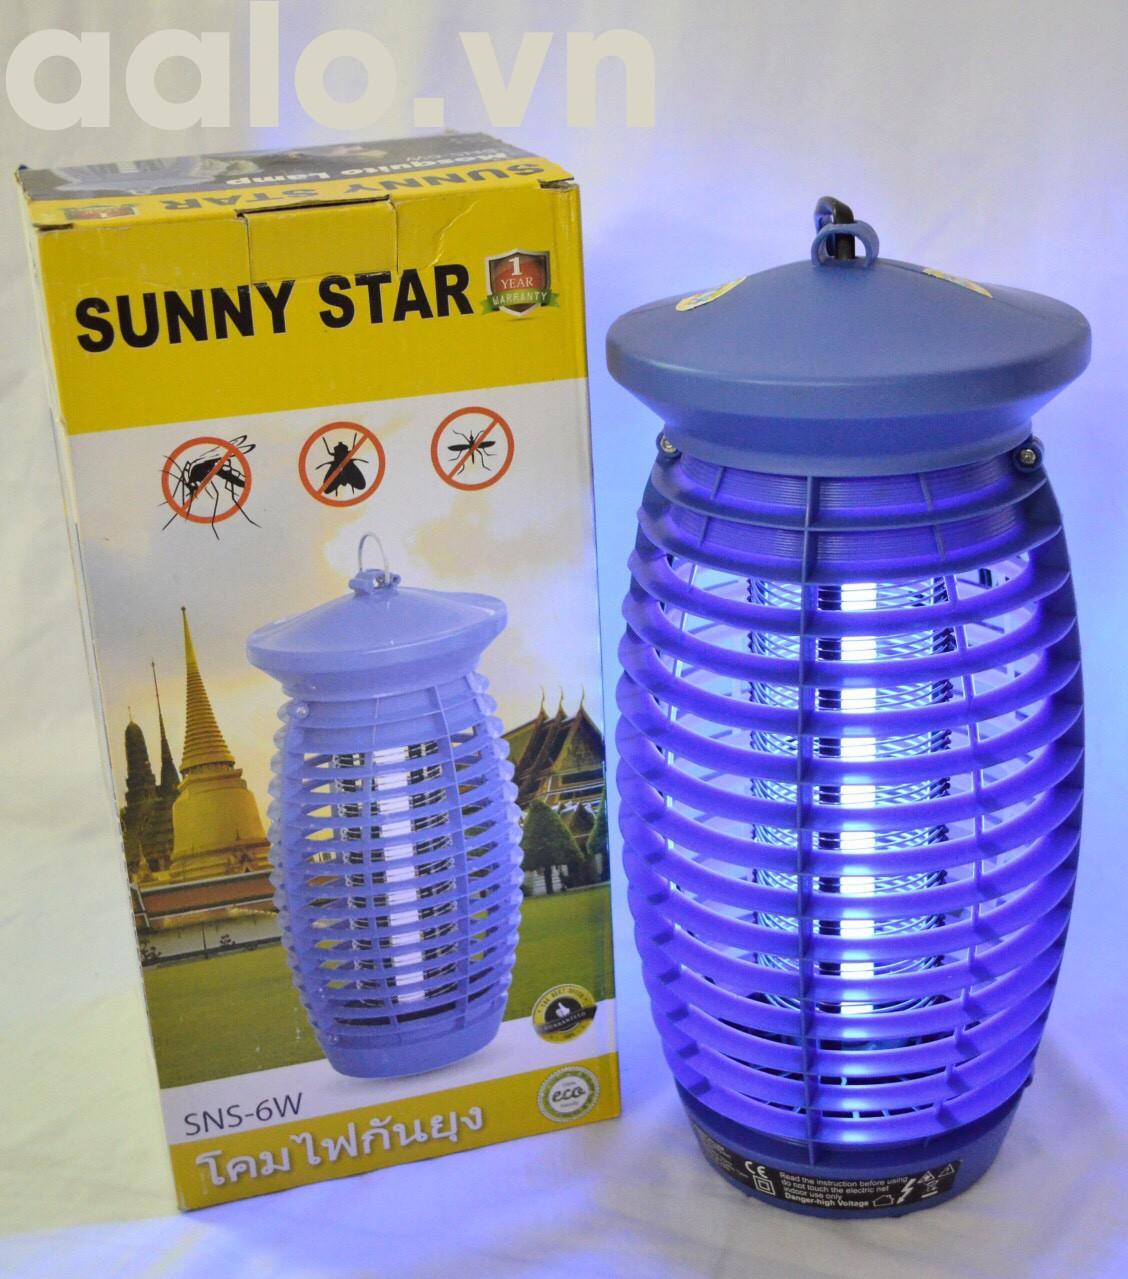 Thiết bị diệt muỗi SUNNY STAR XANH - 6W